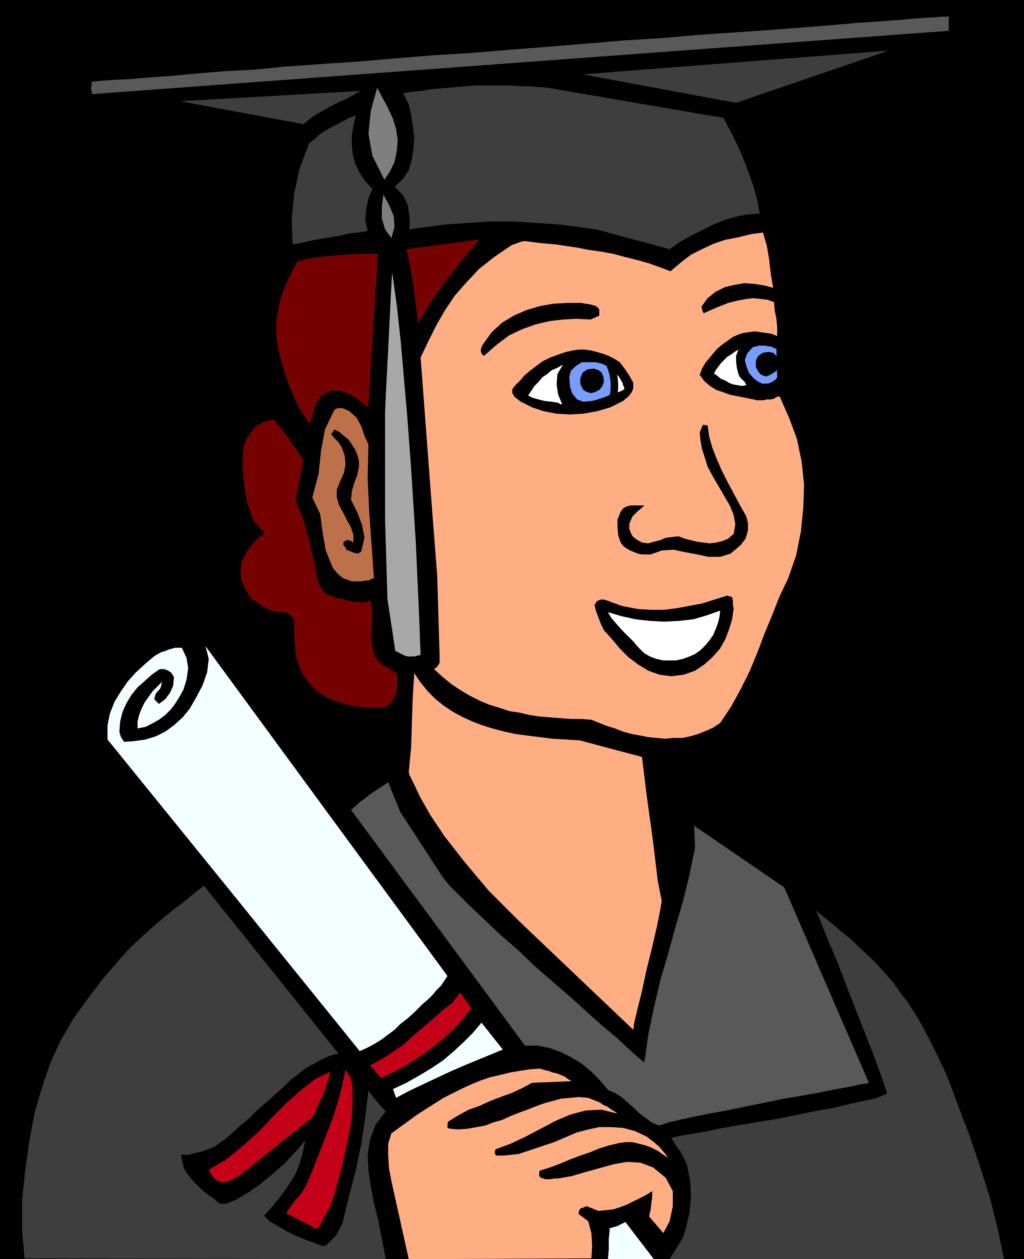 Путь аспиранта / докторанта / профессора / студента 558b2e10